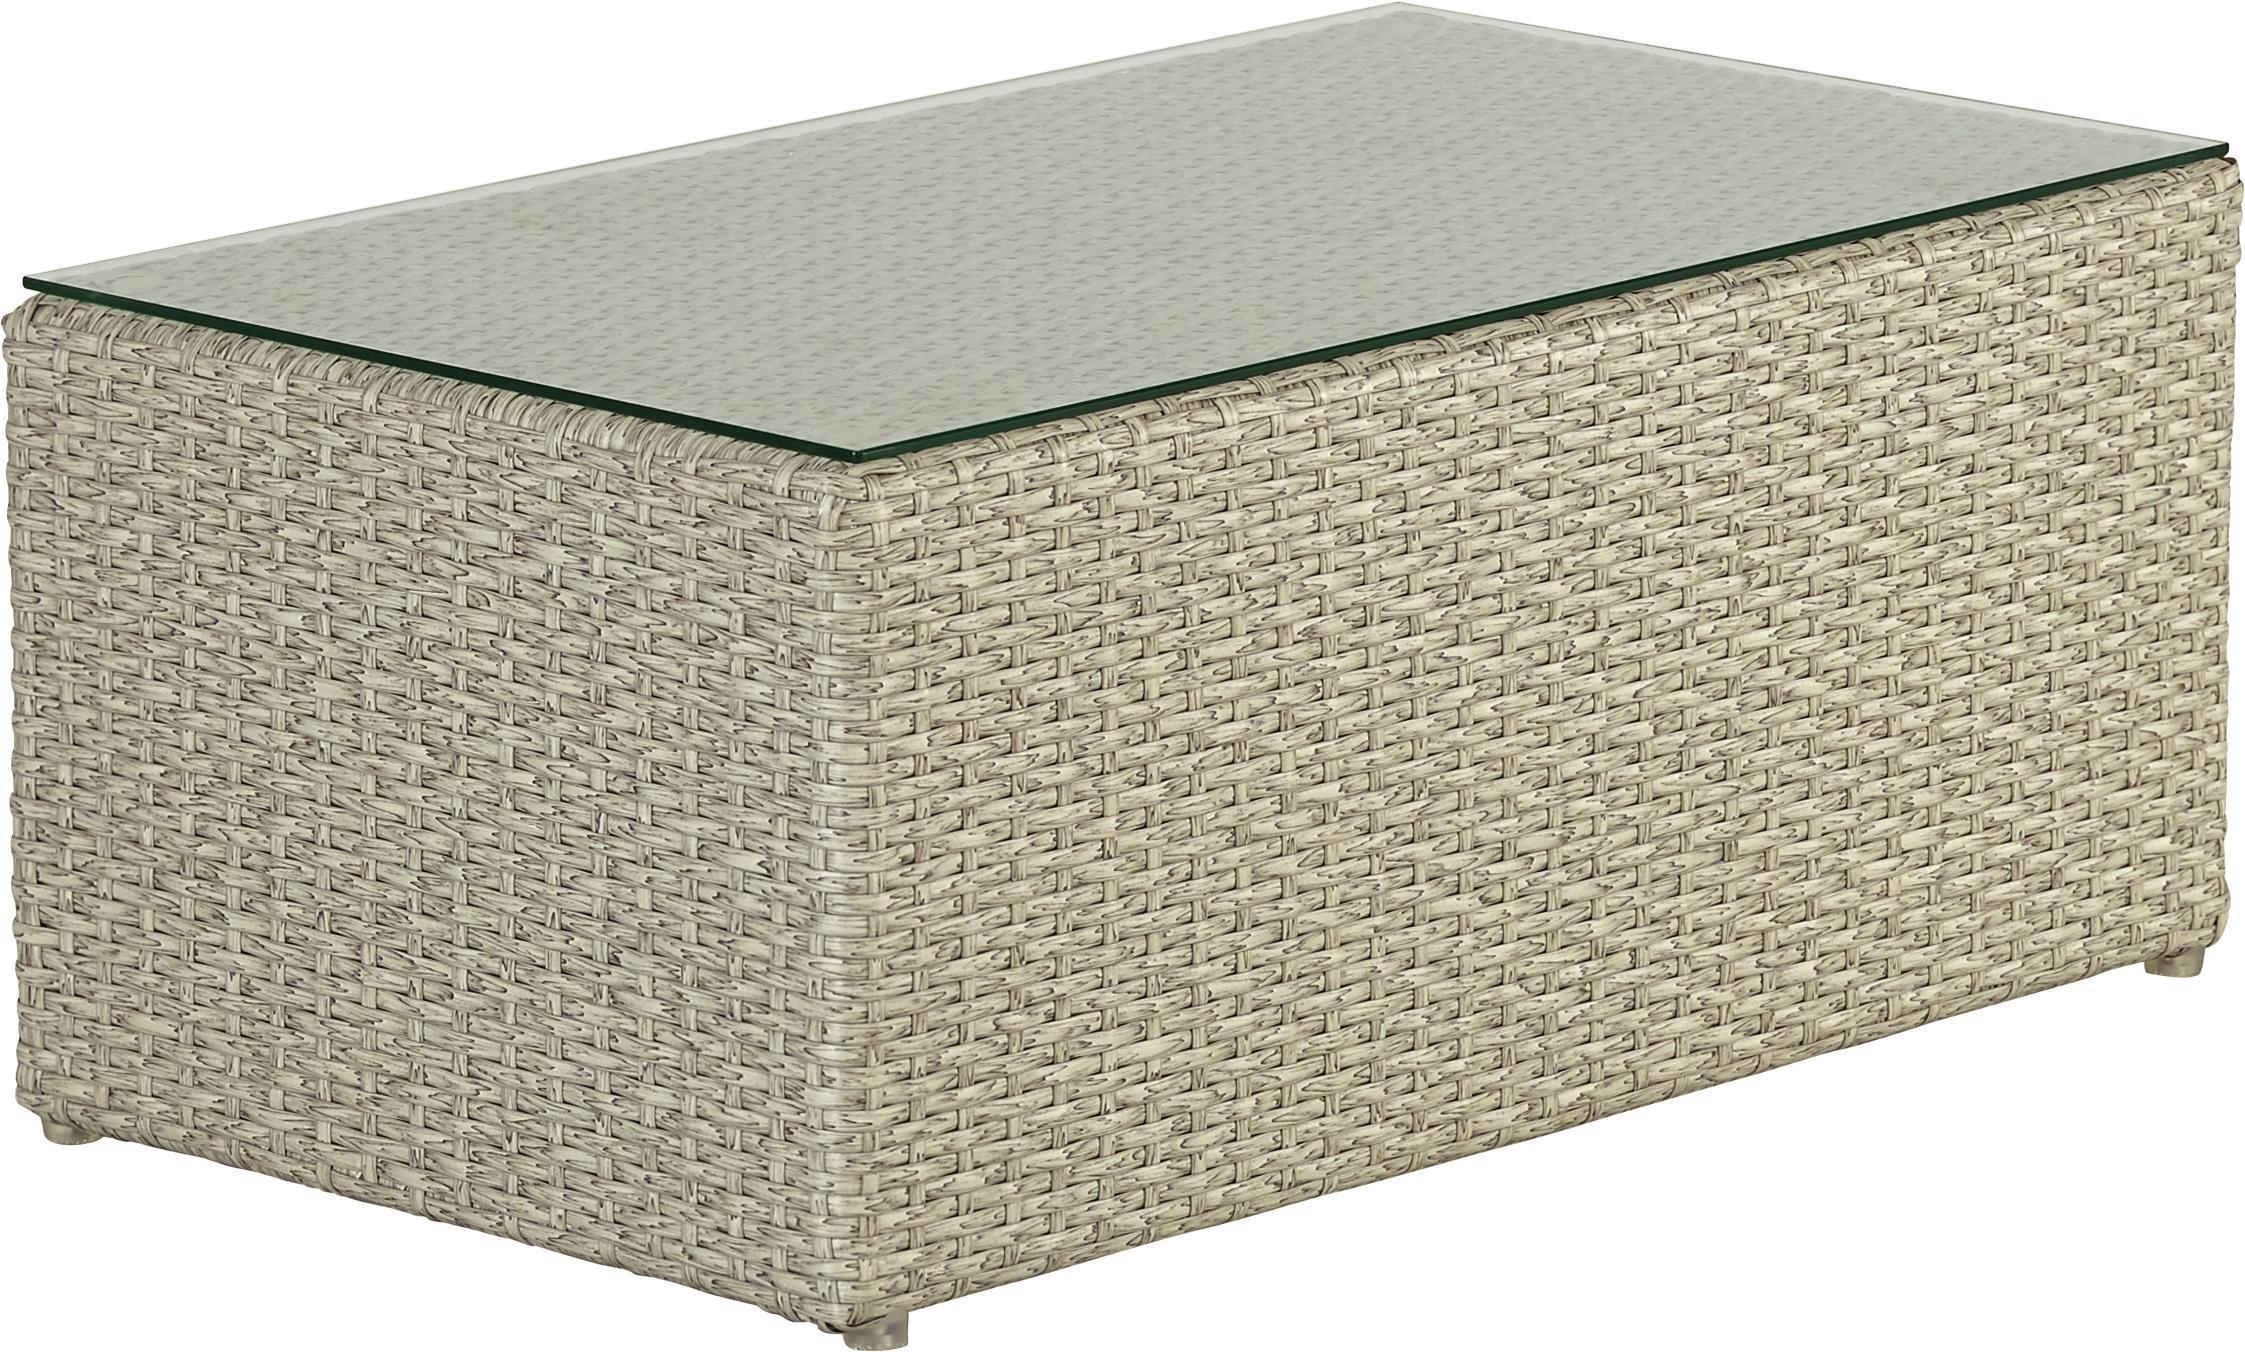 ber hmt heidesch nke wolthausen ideen die besten. Black Bedroom Furniture Sets. Home Design Ideas